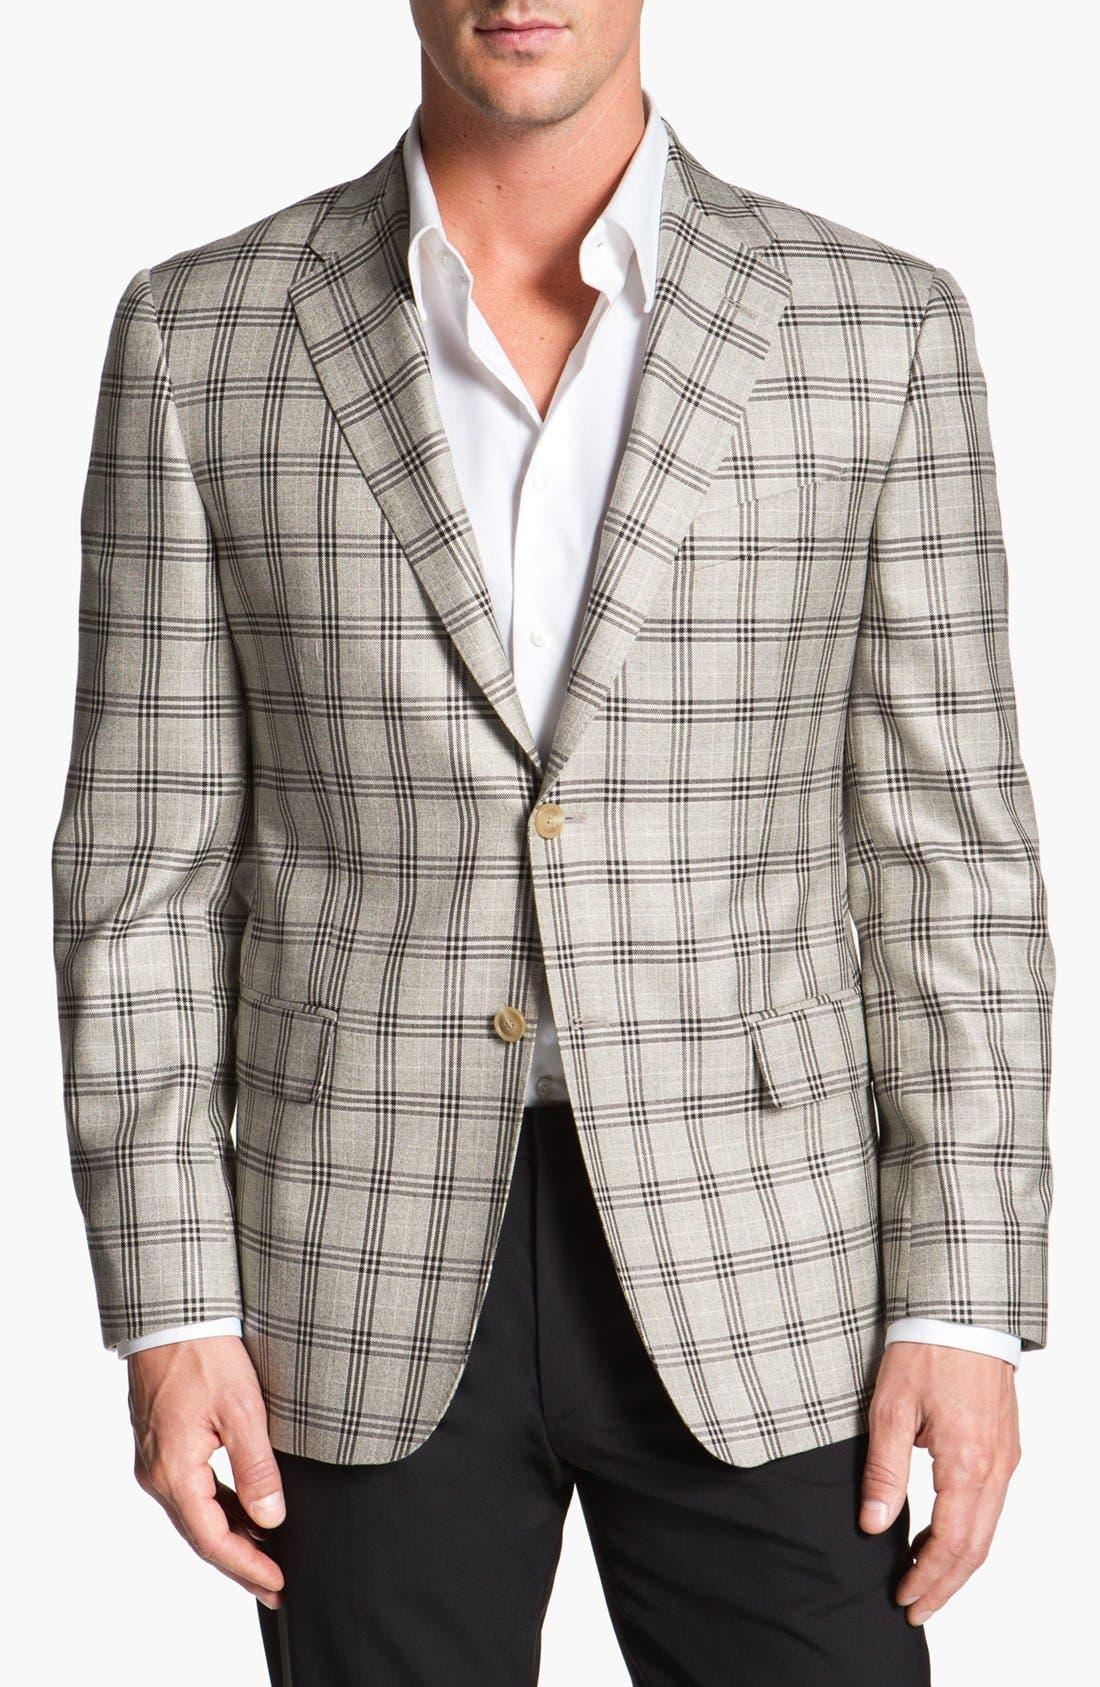 Alternate Image 1 Selected - Joseph Abboud 'Platinum' Plaid Wool Sportcoat